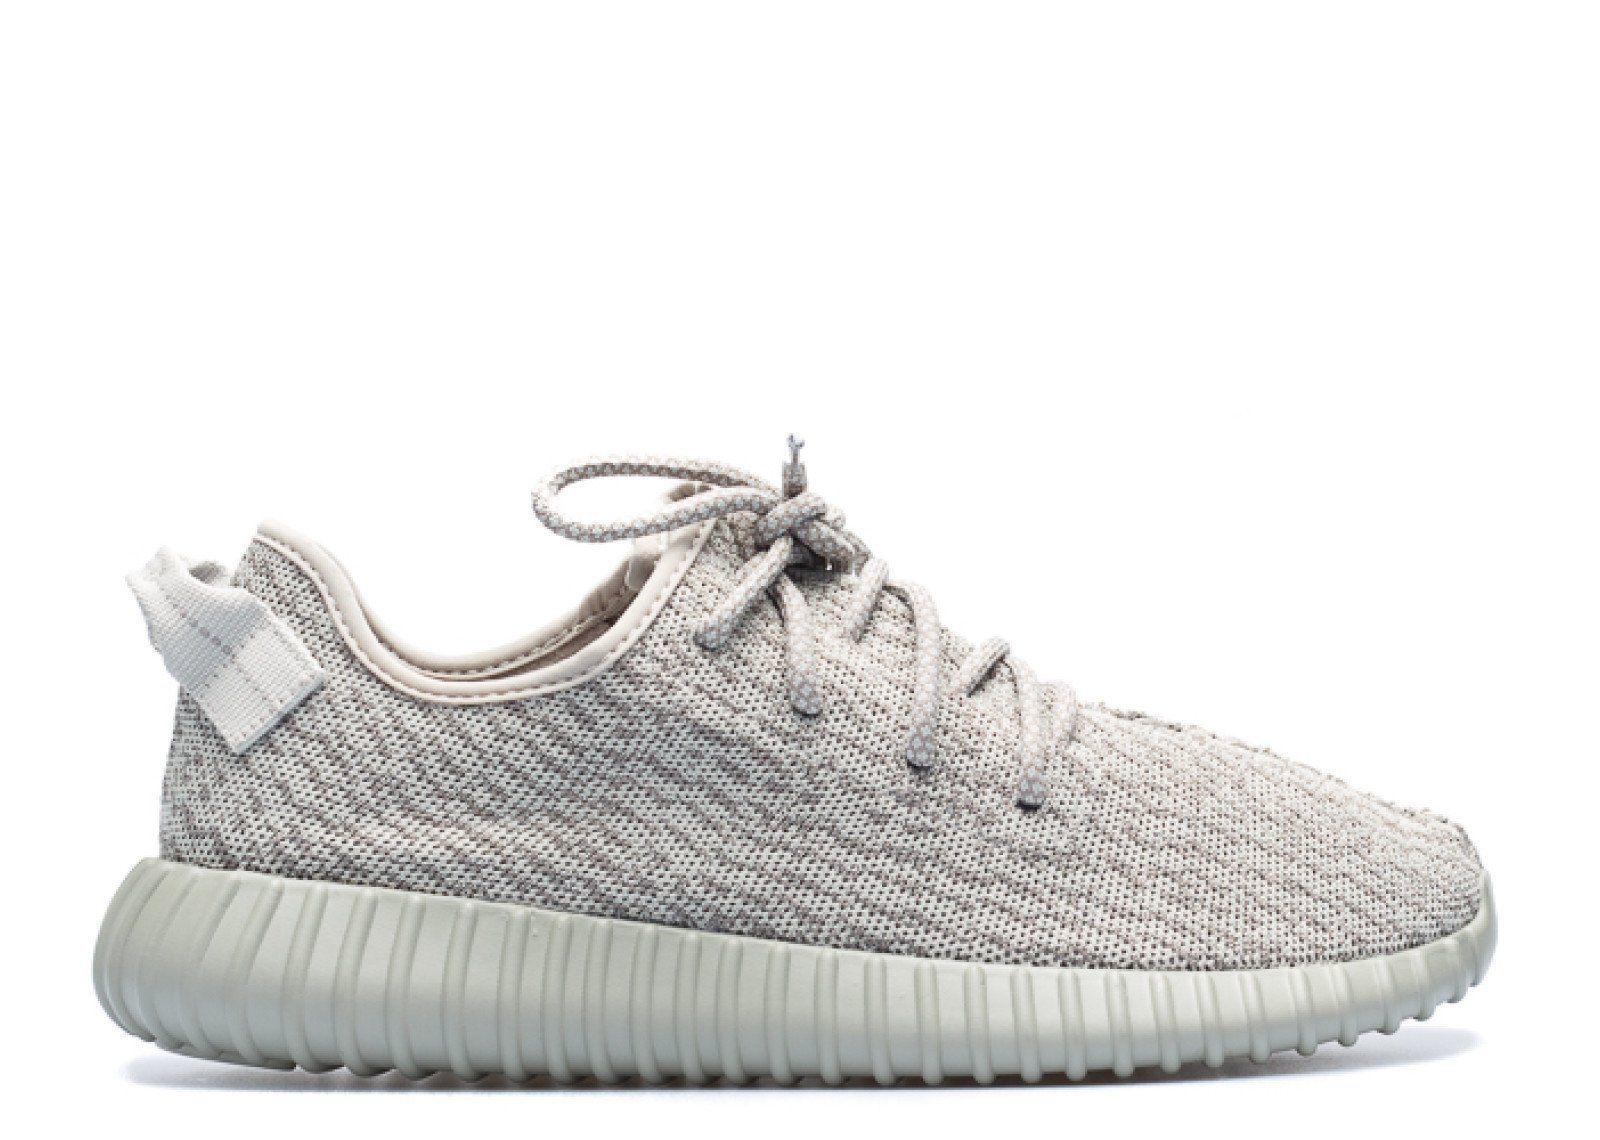 Adidas Yeezy Boost 350 Moonrock https://tmblr.co/ZmD_Wd2QMvUbG